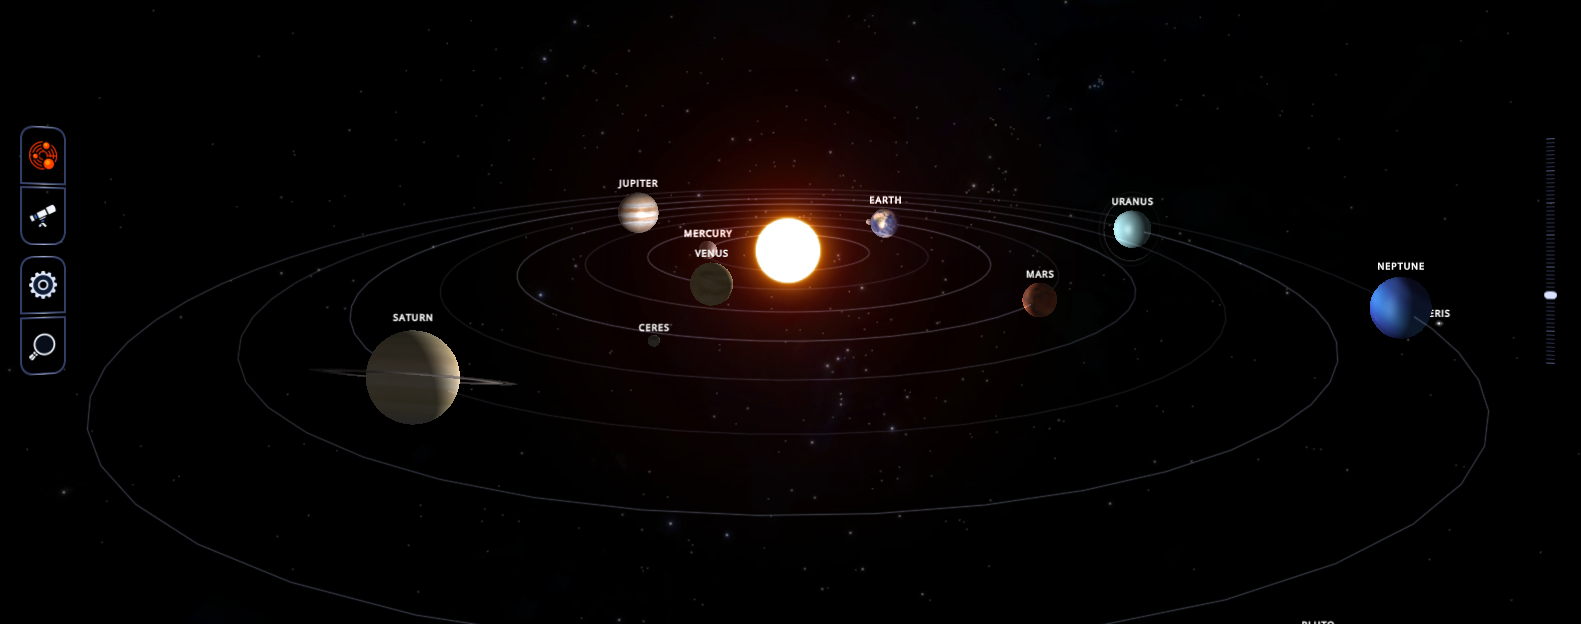 virtual solar system - photo #24